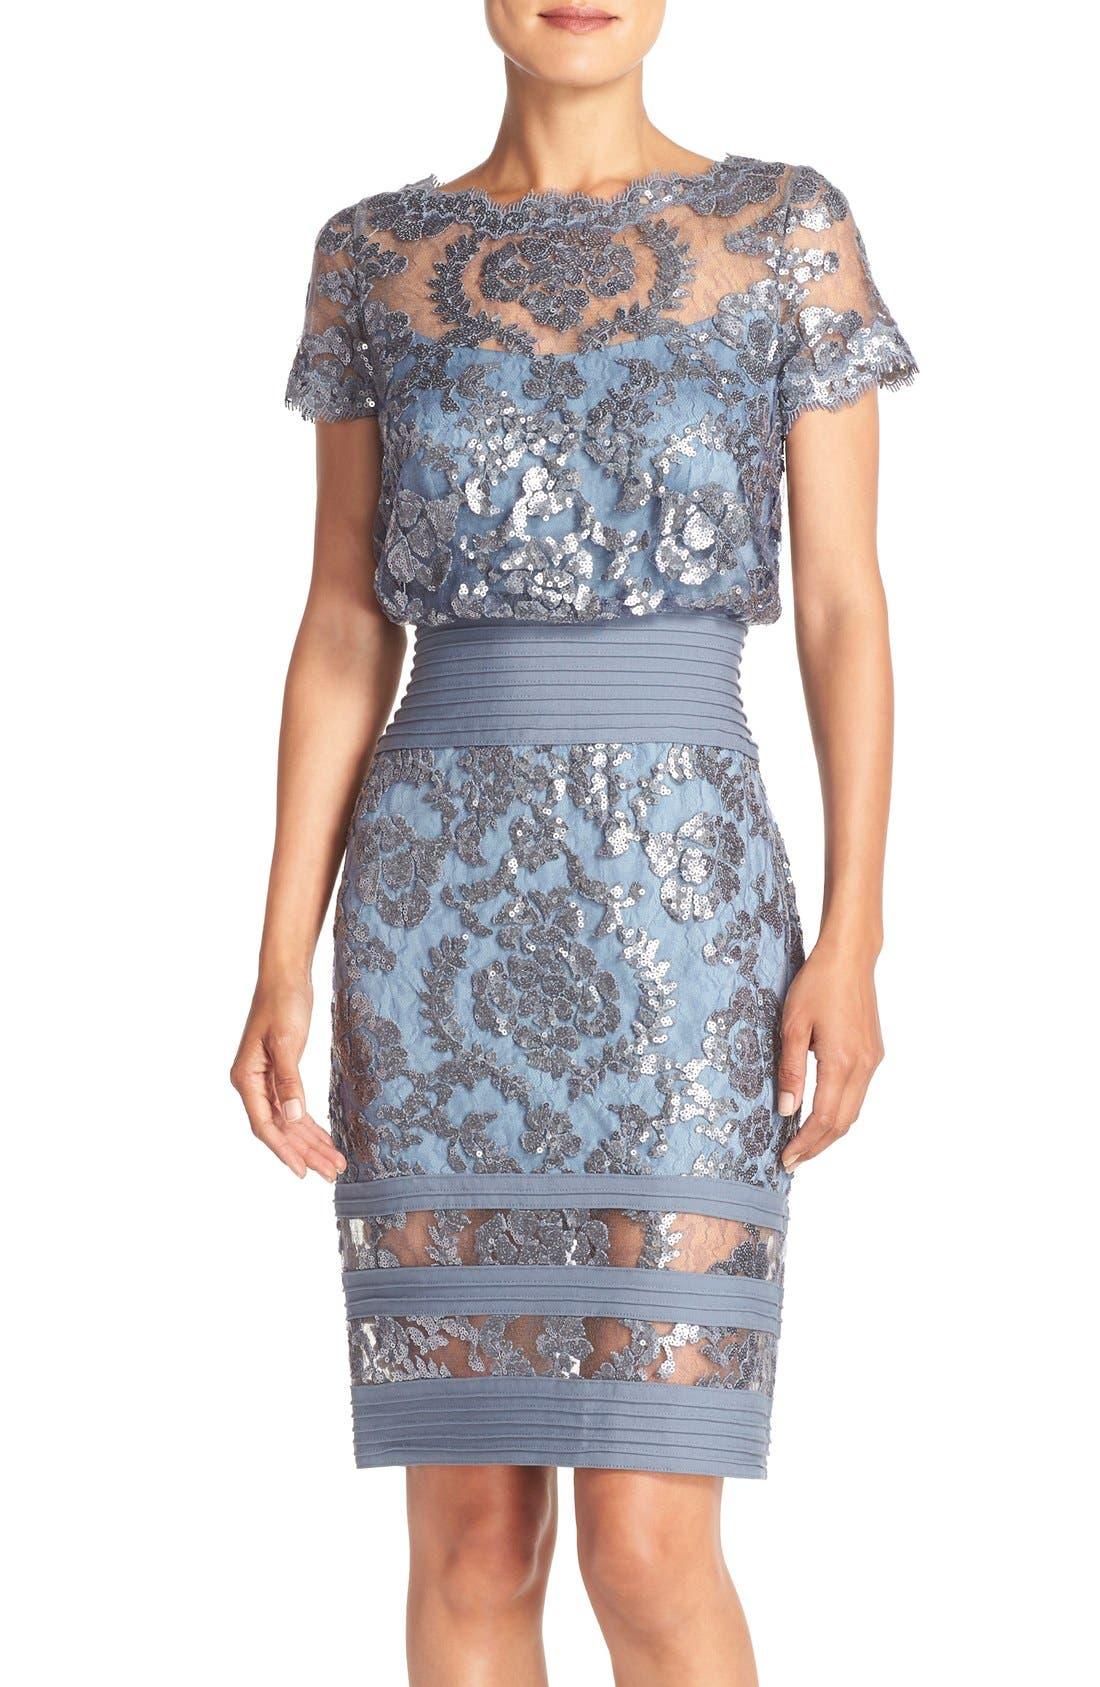 Alternate Image 1 Selected - Tadashi Shoji Sequin Embroidered Blouson Dress (Regular & Petite)